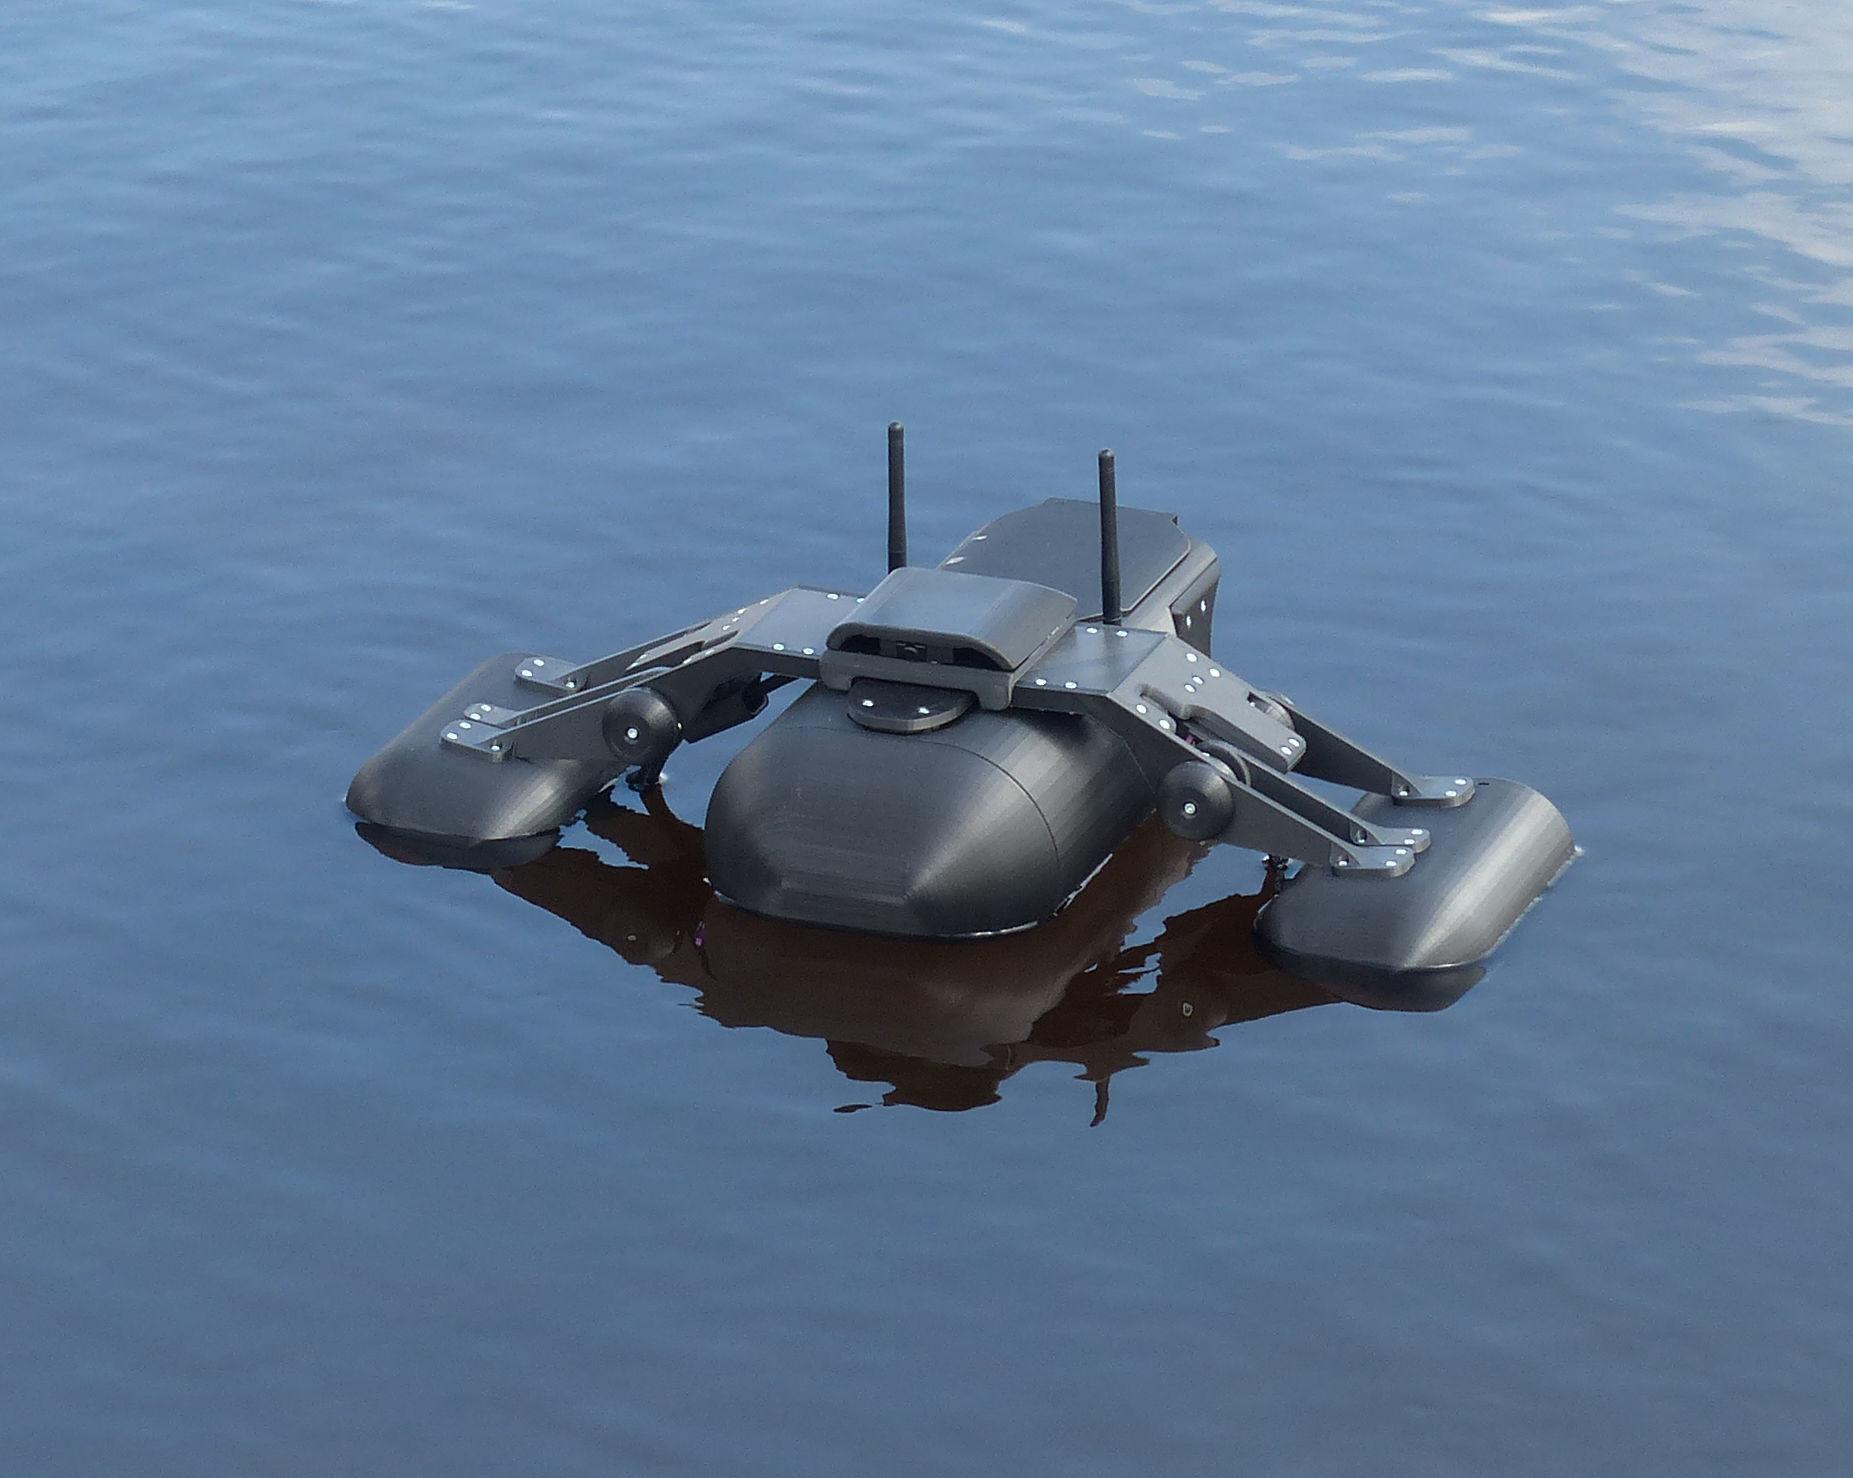 Drone AquaPod V2 for 3D print